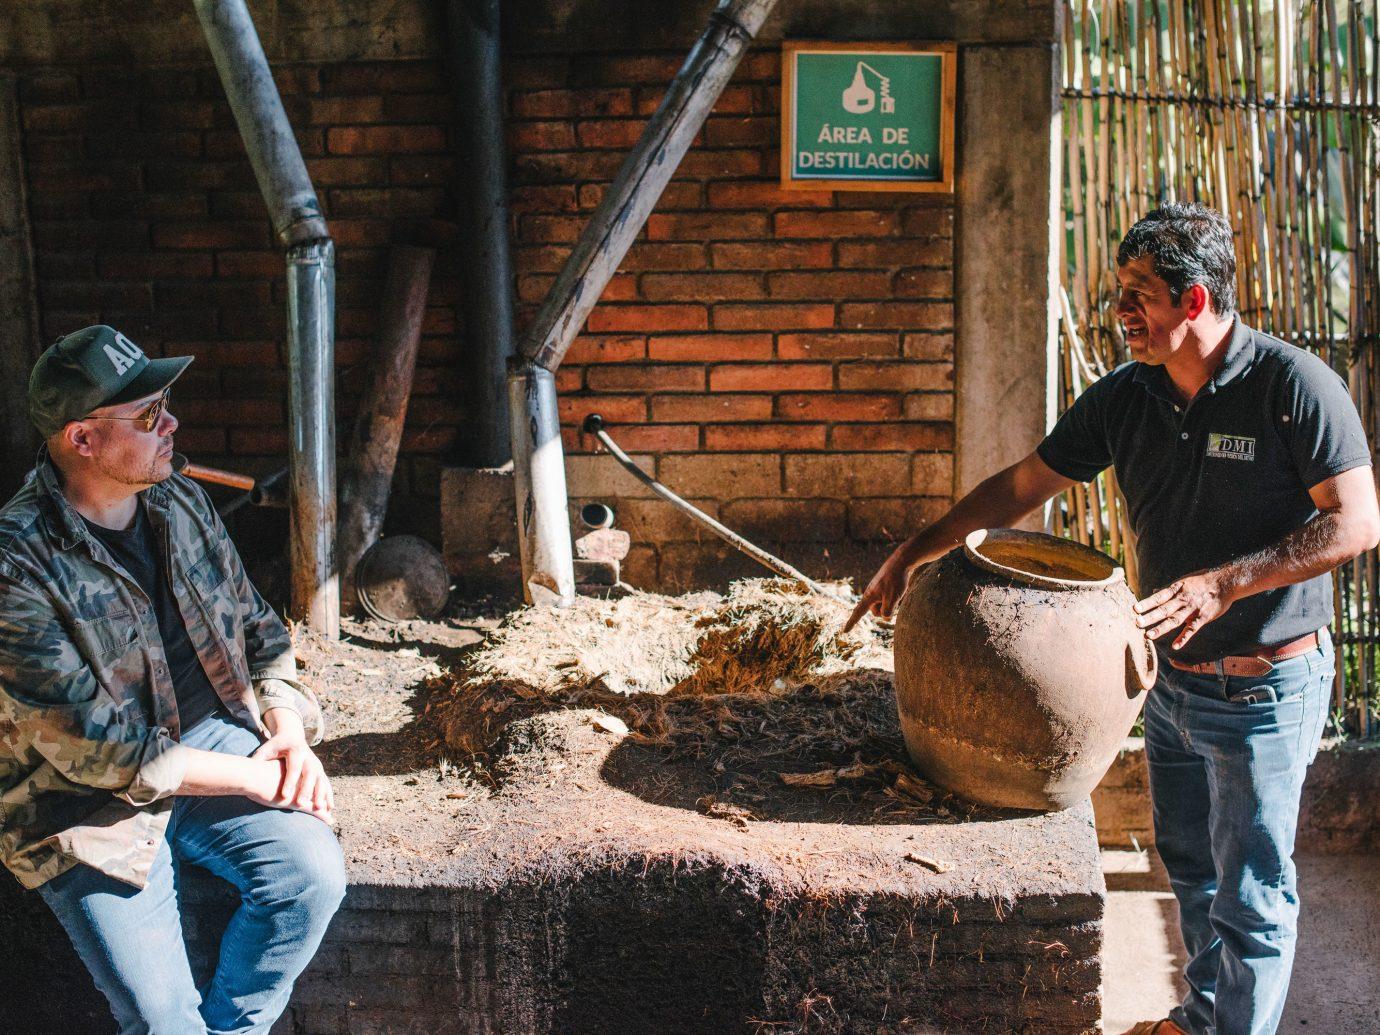 Arts + Culture Mexico Oaxaca Trip Ideas tree soil recreation plant laborer